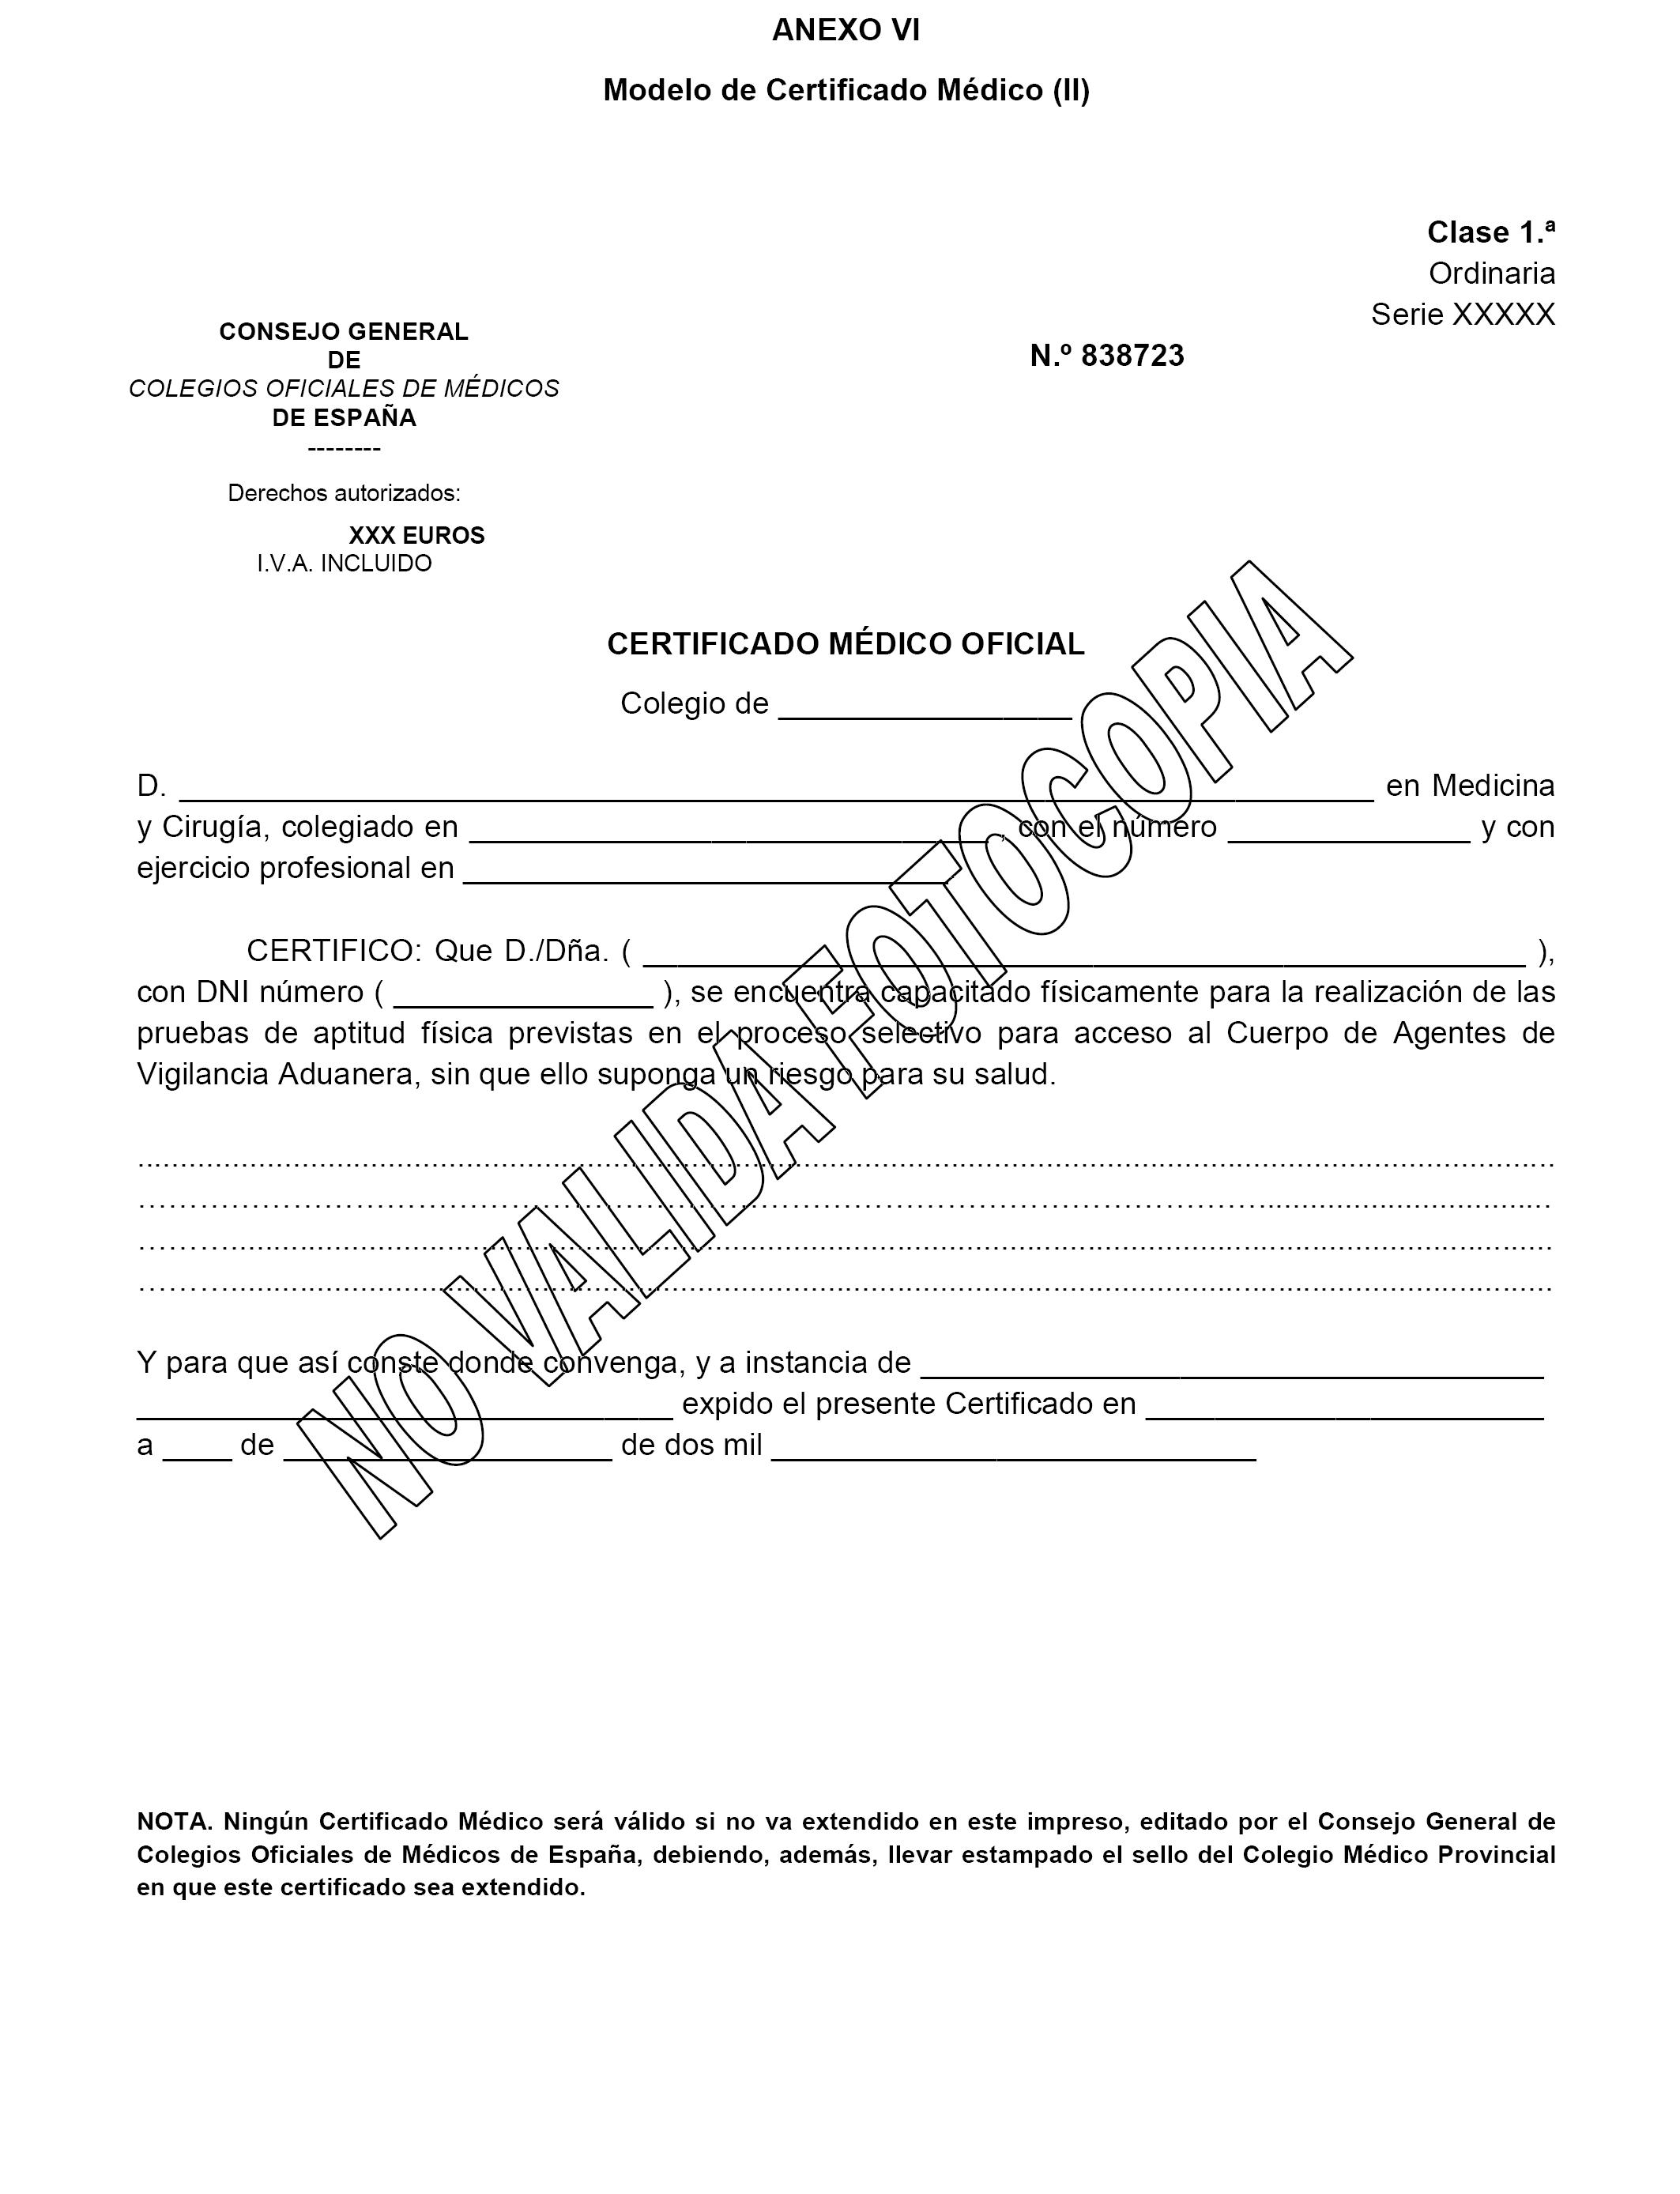 BOE.es - Documento BOE-A-2018-4498